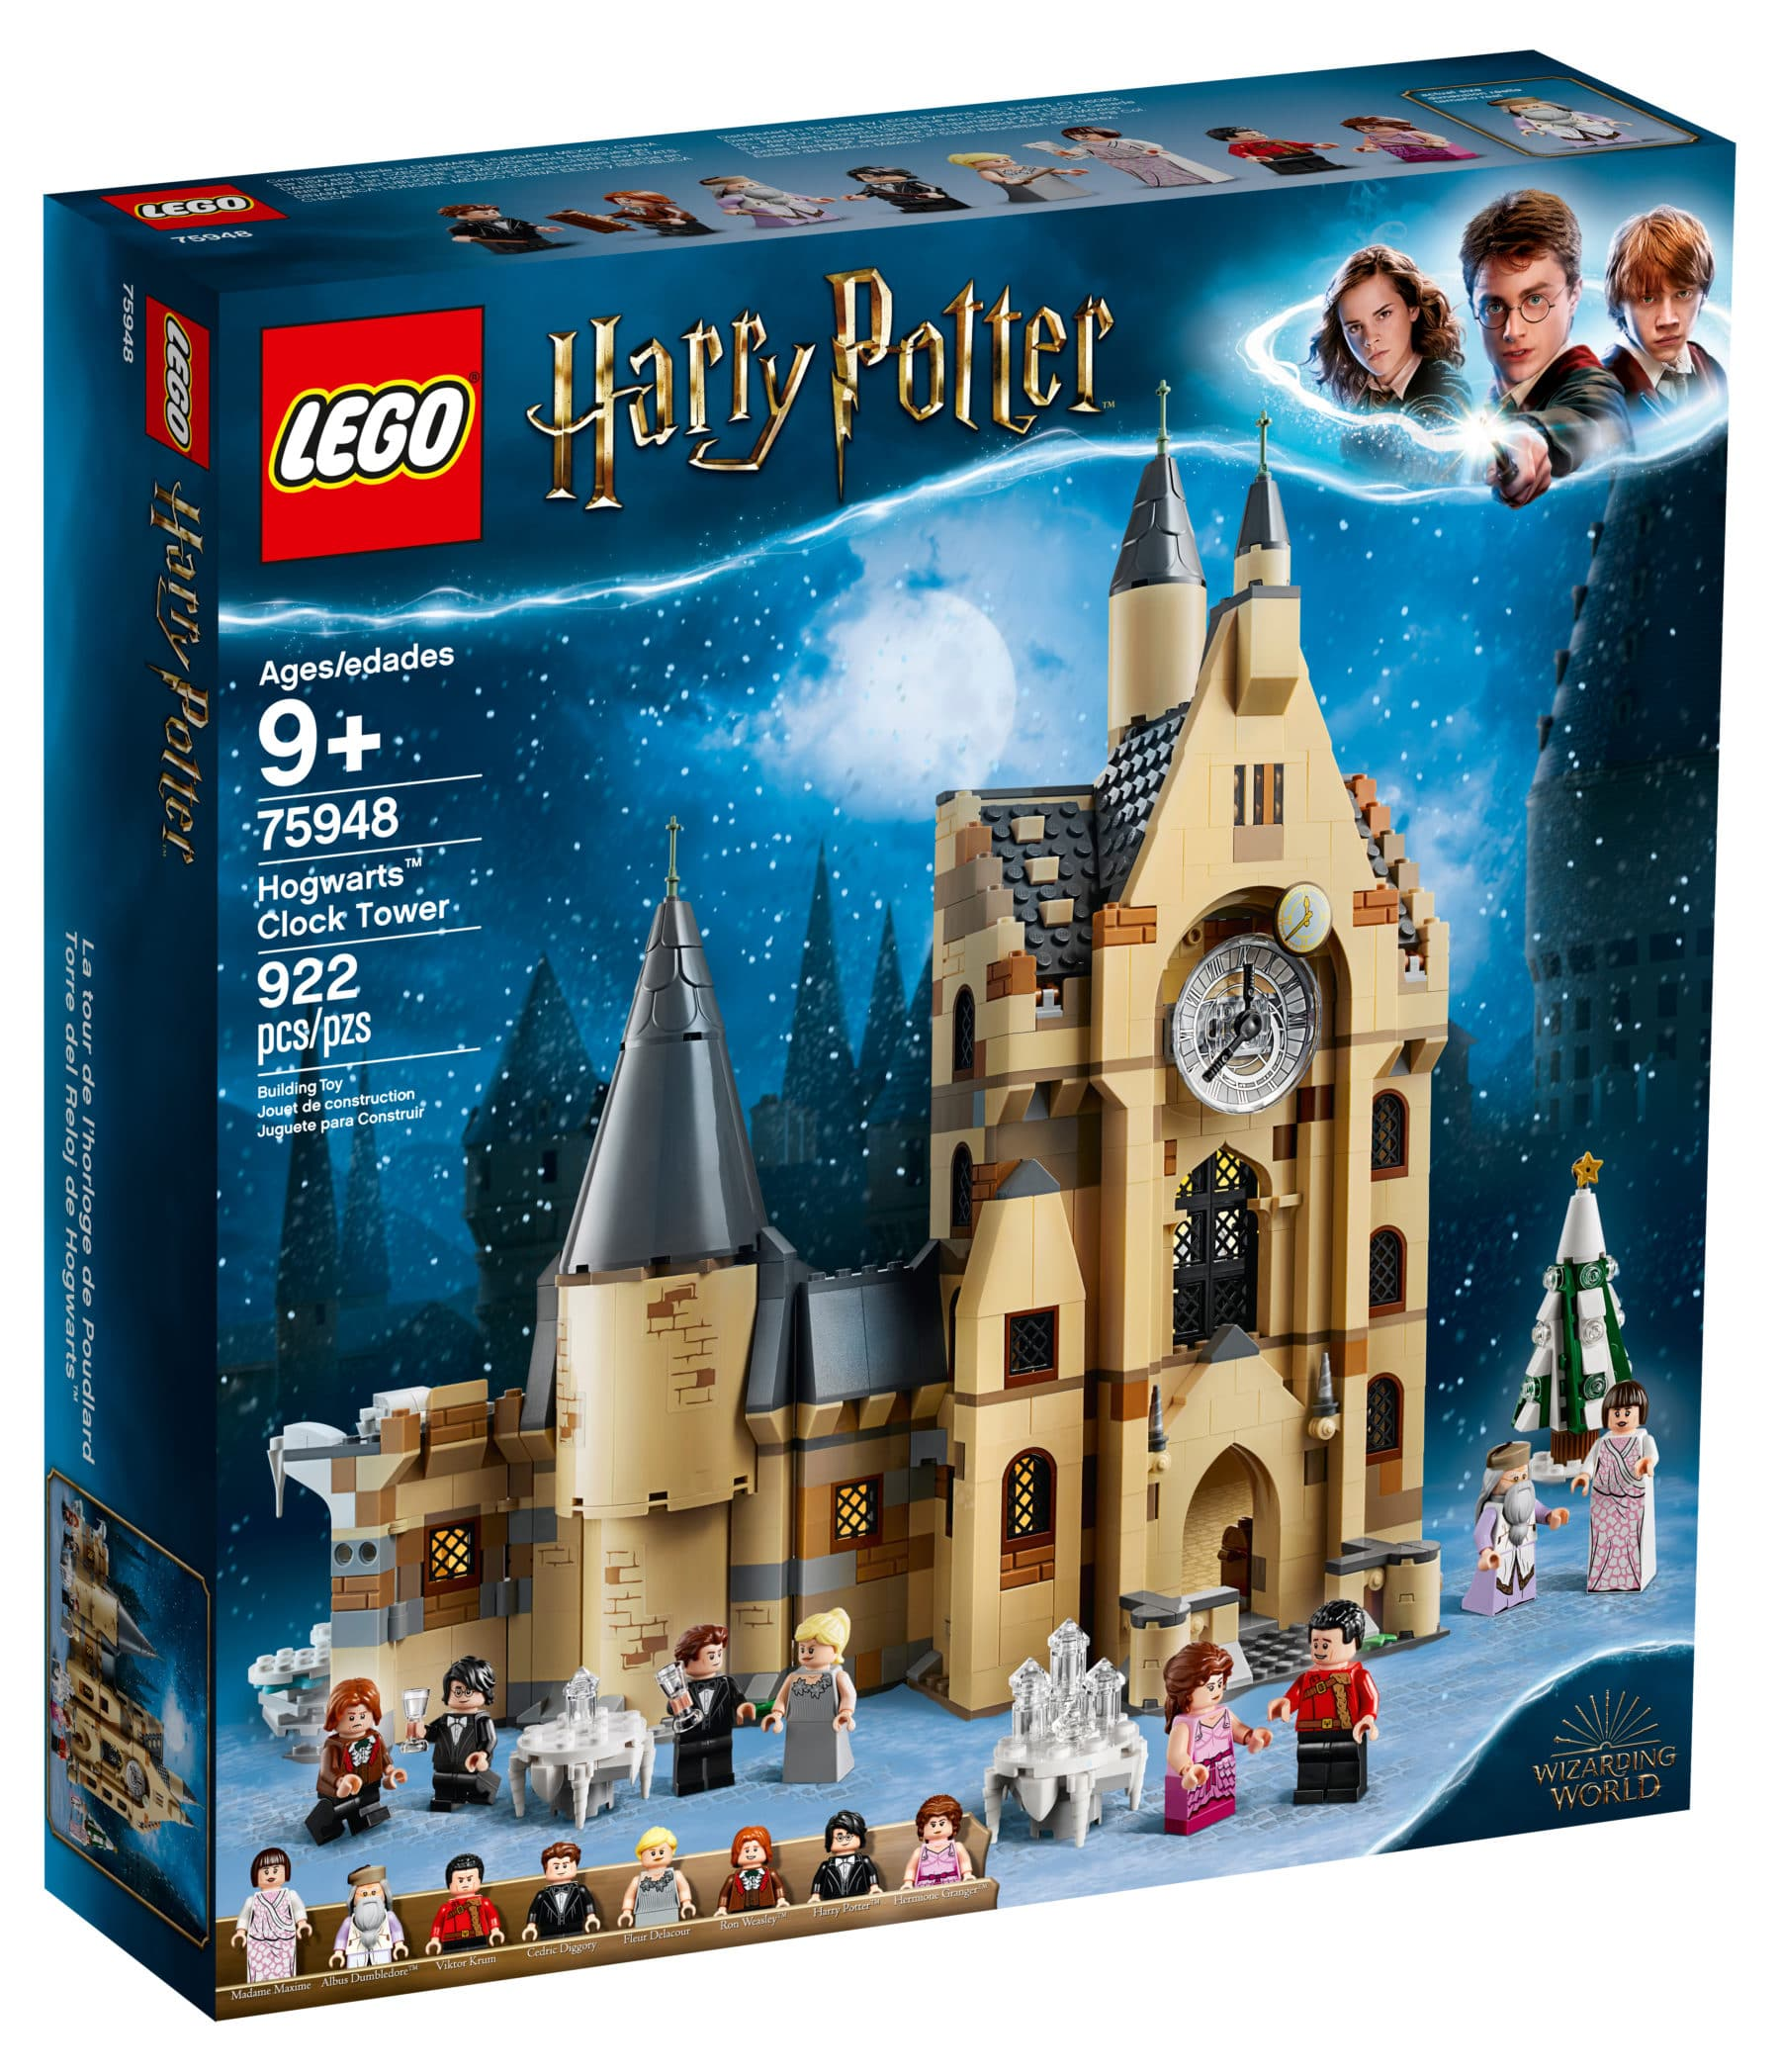 LEGO Harry Potter 75948 Hogwarts Glockenturm